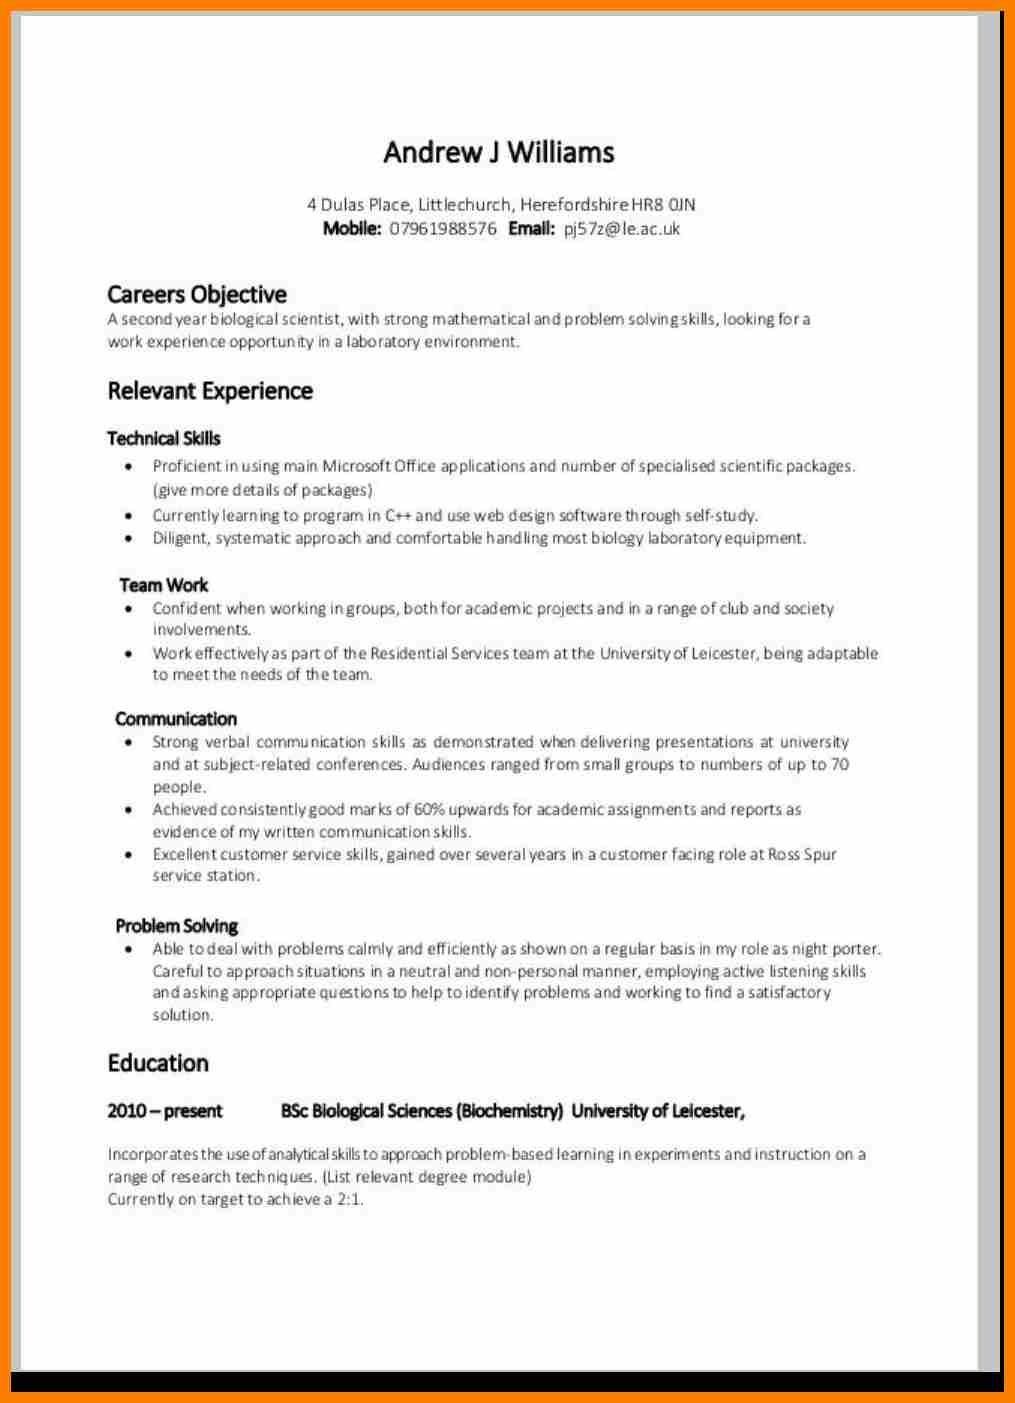 Cv Template For Over 60 Resume Format Resume Examples Resume Skills Sales Resume Examples